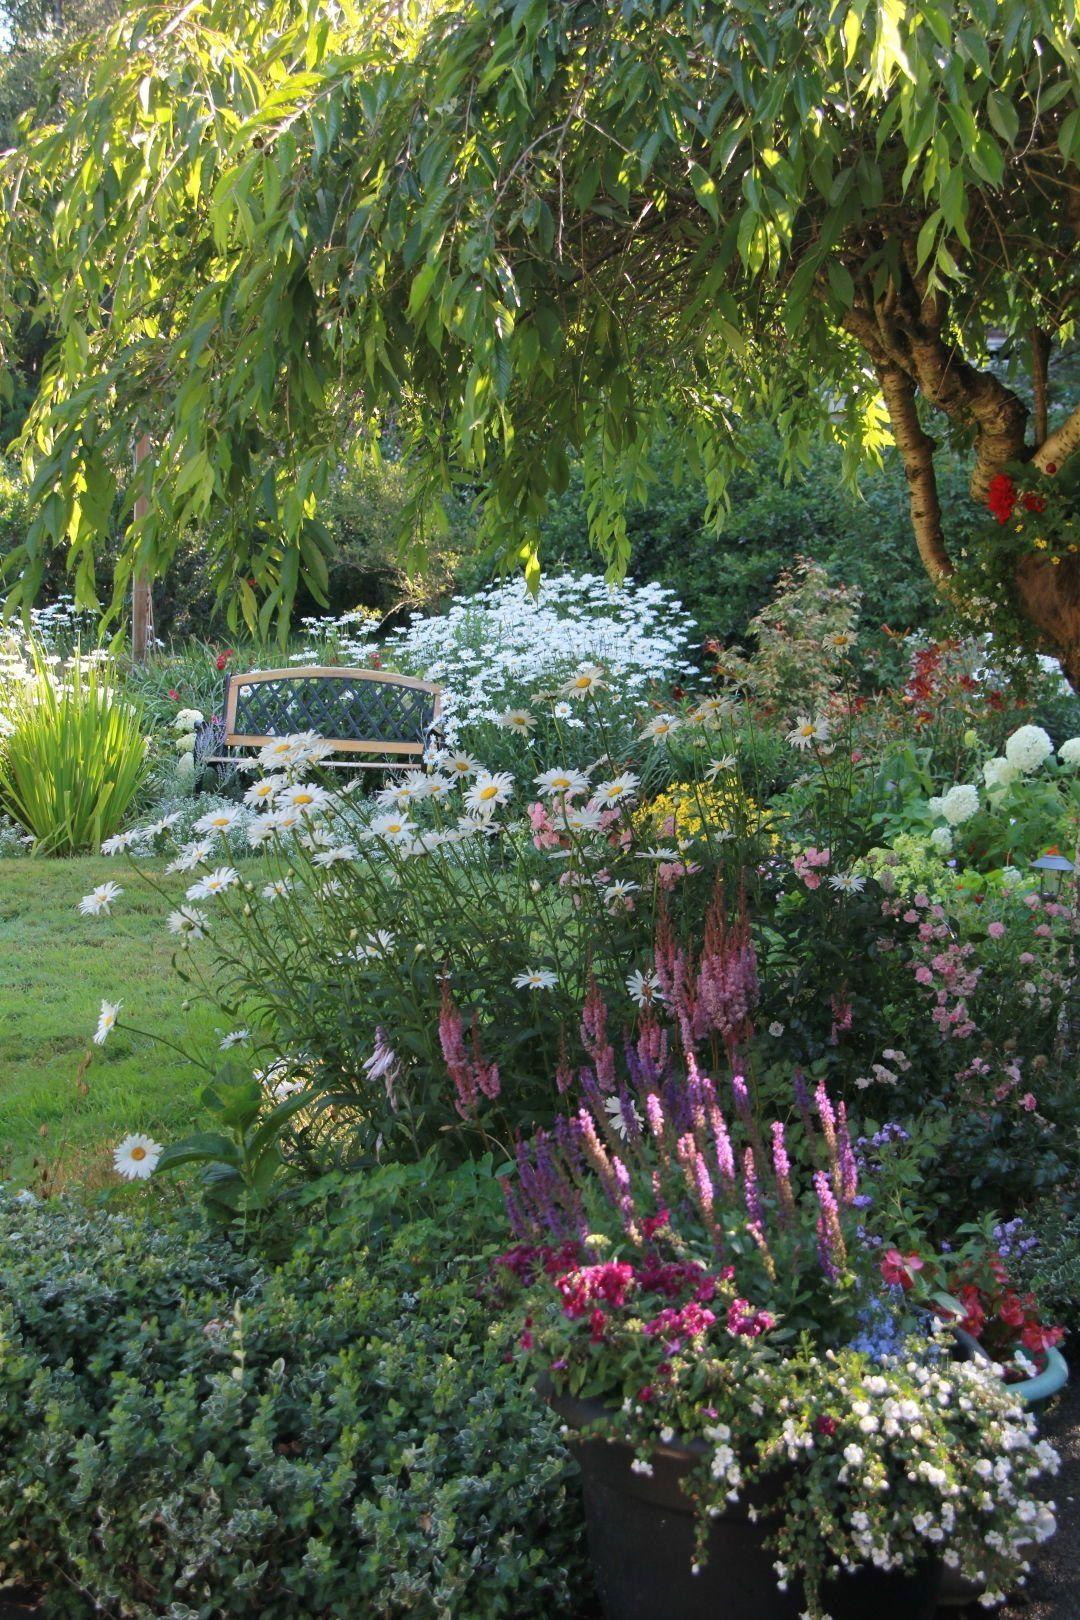 Garden Design Tool Hyttehage Hagedesign Vakre Hager Backyard garden design tool